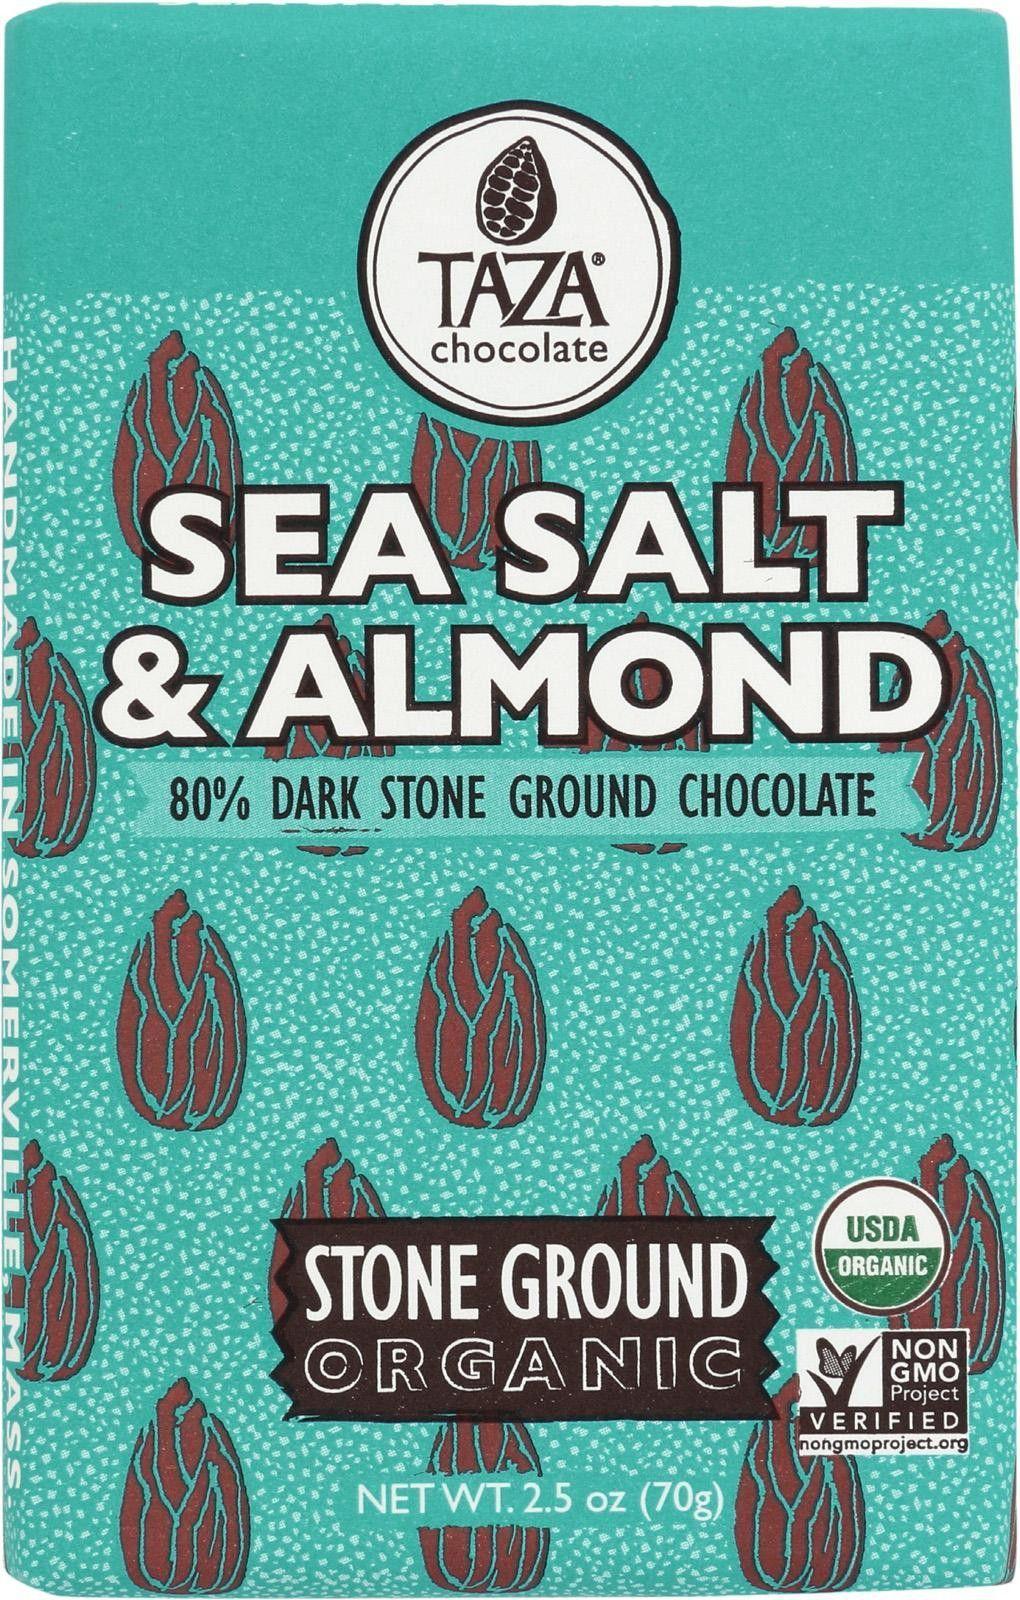 Taza Chocolate Stone Ground Organic Dark Chocolate Bar - Sea Salt And Almond - Case Of 10 - 2.5 Oz.